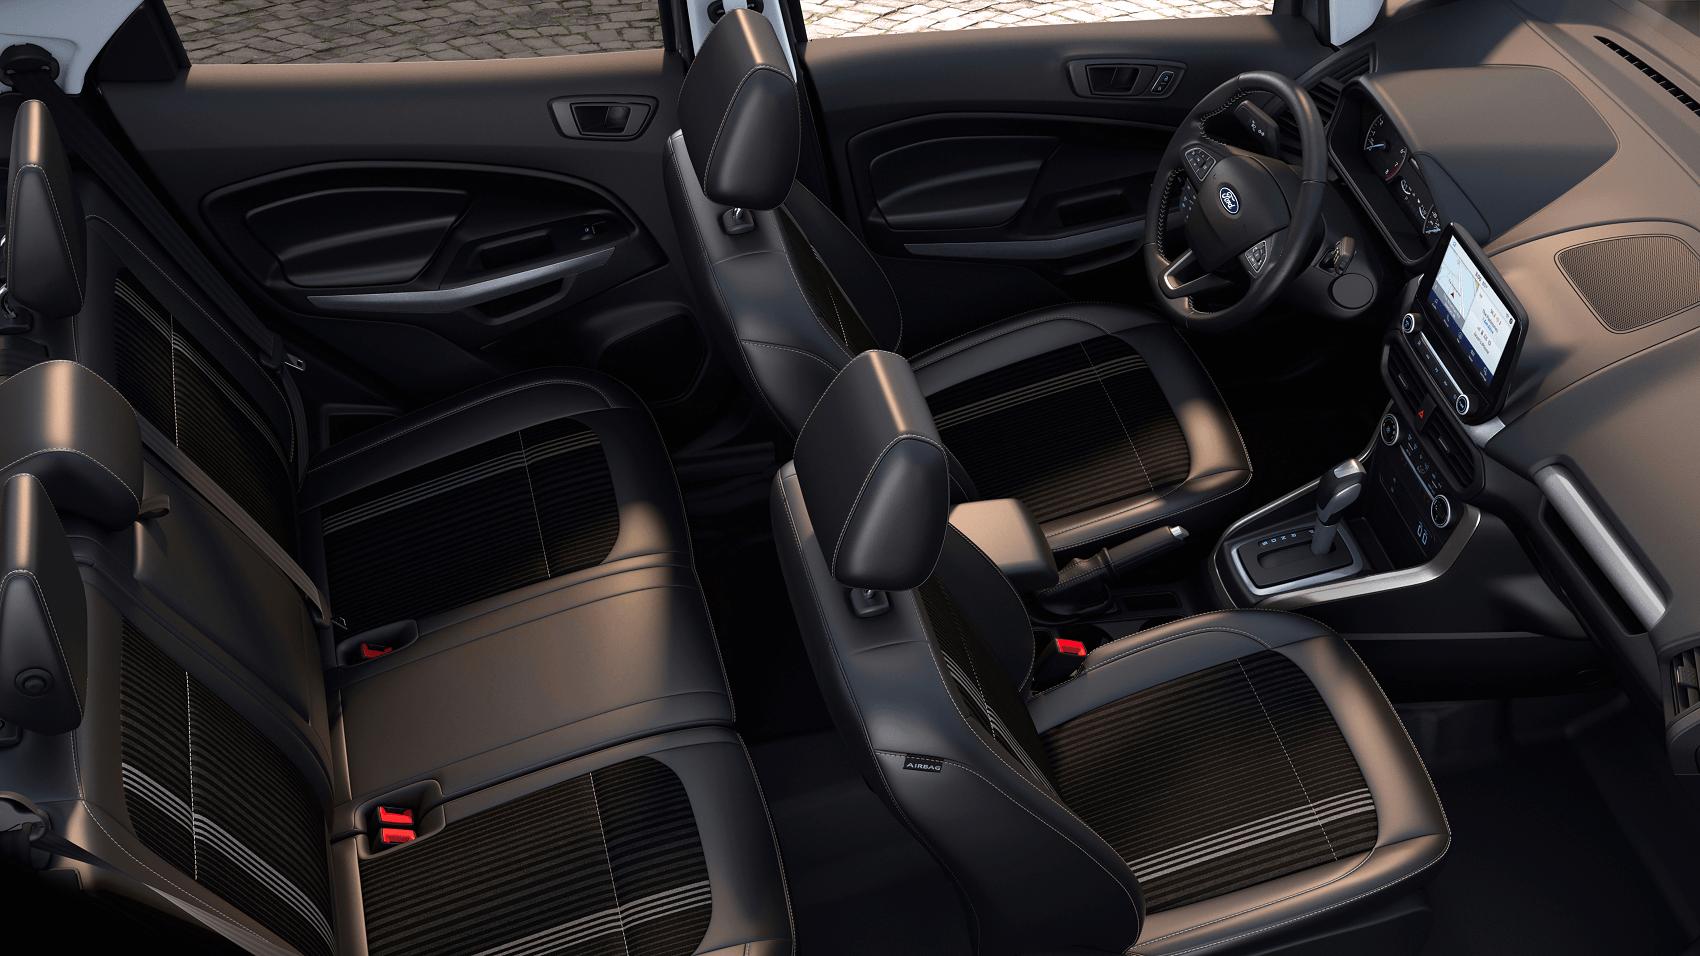 Ford EcoSport Interior Dimensions